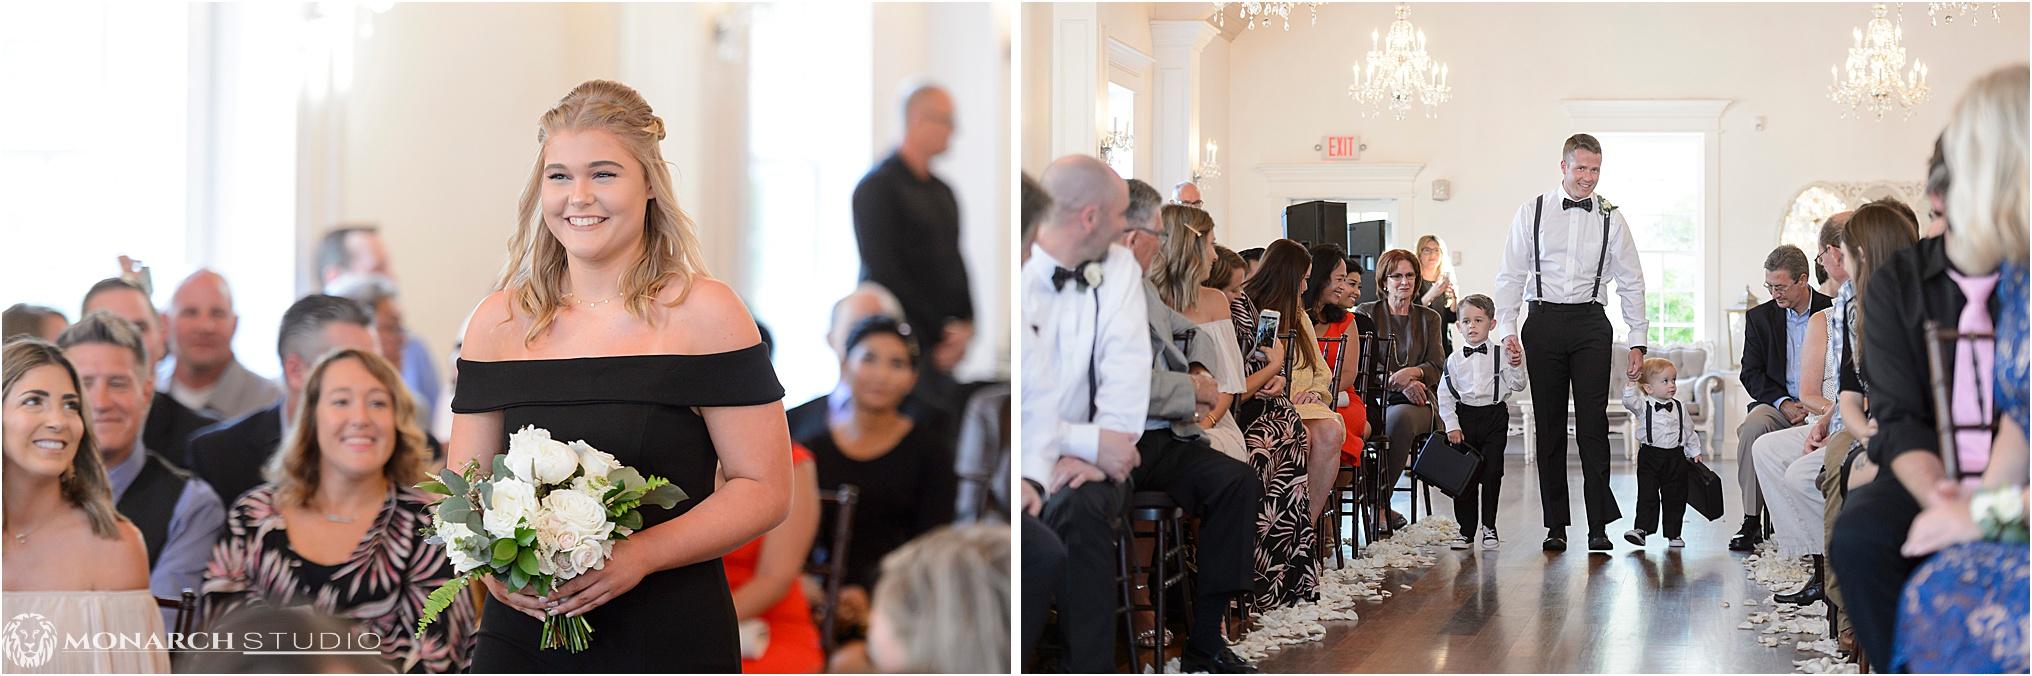 064-whiteroom-wedding-photographer-2019-05-22_0046.jpg